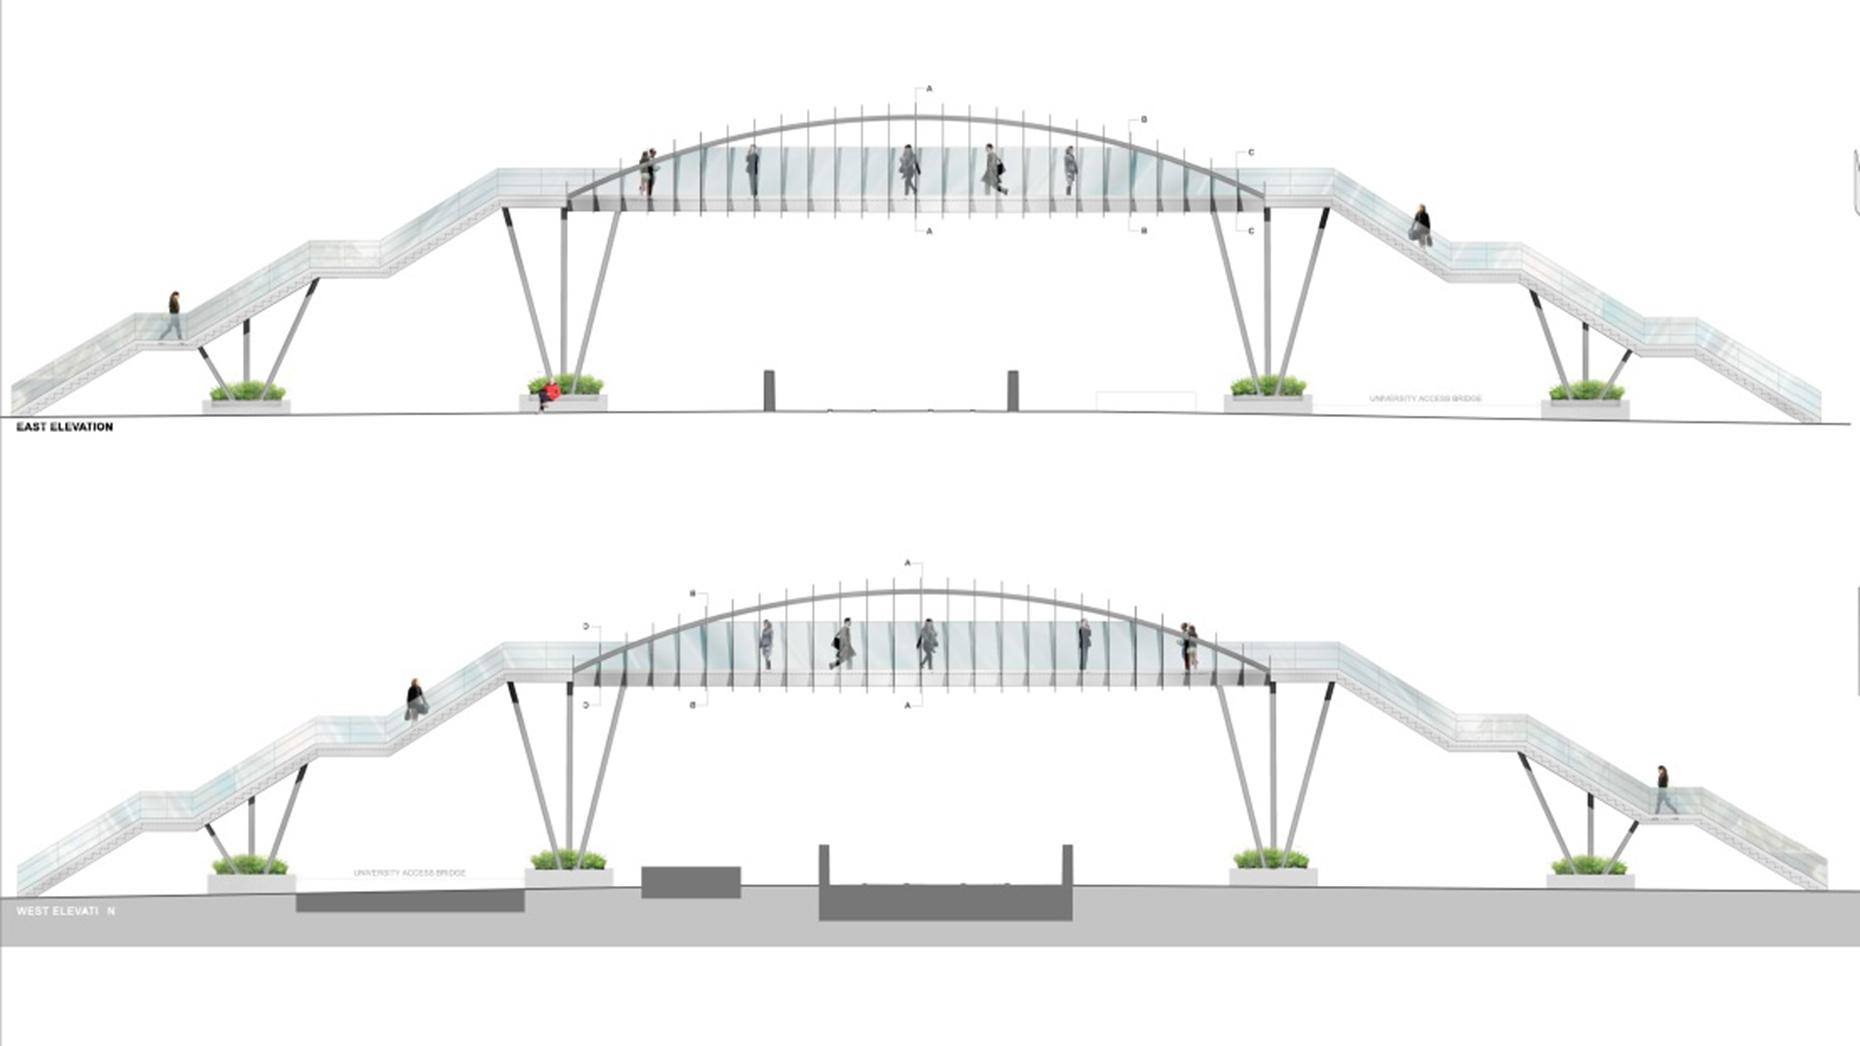 New designs revealed for the Brayford Wharf footbridge on April 8, 2016. Photo: Network Rail